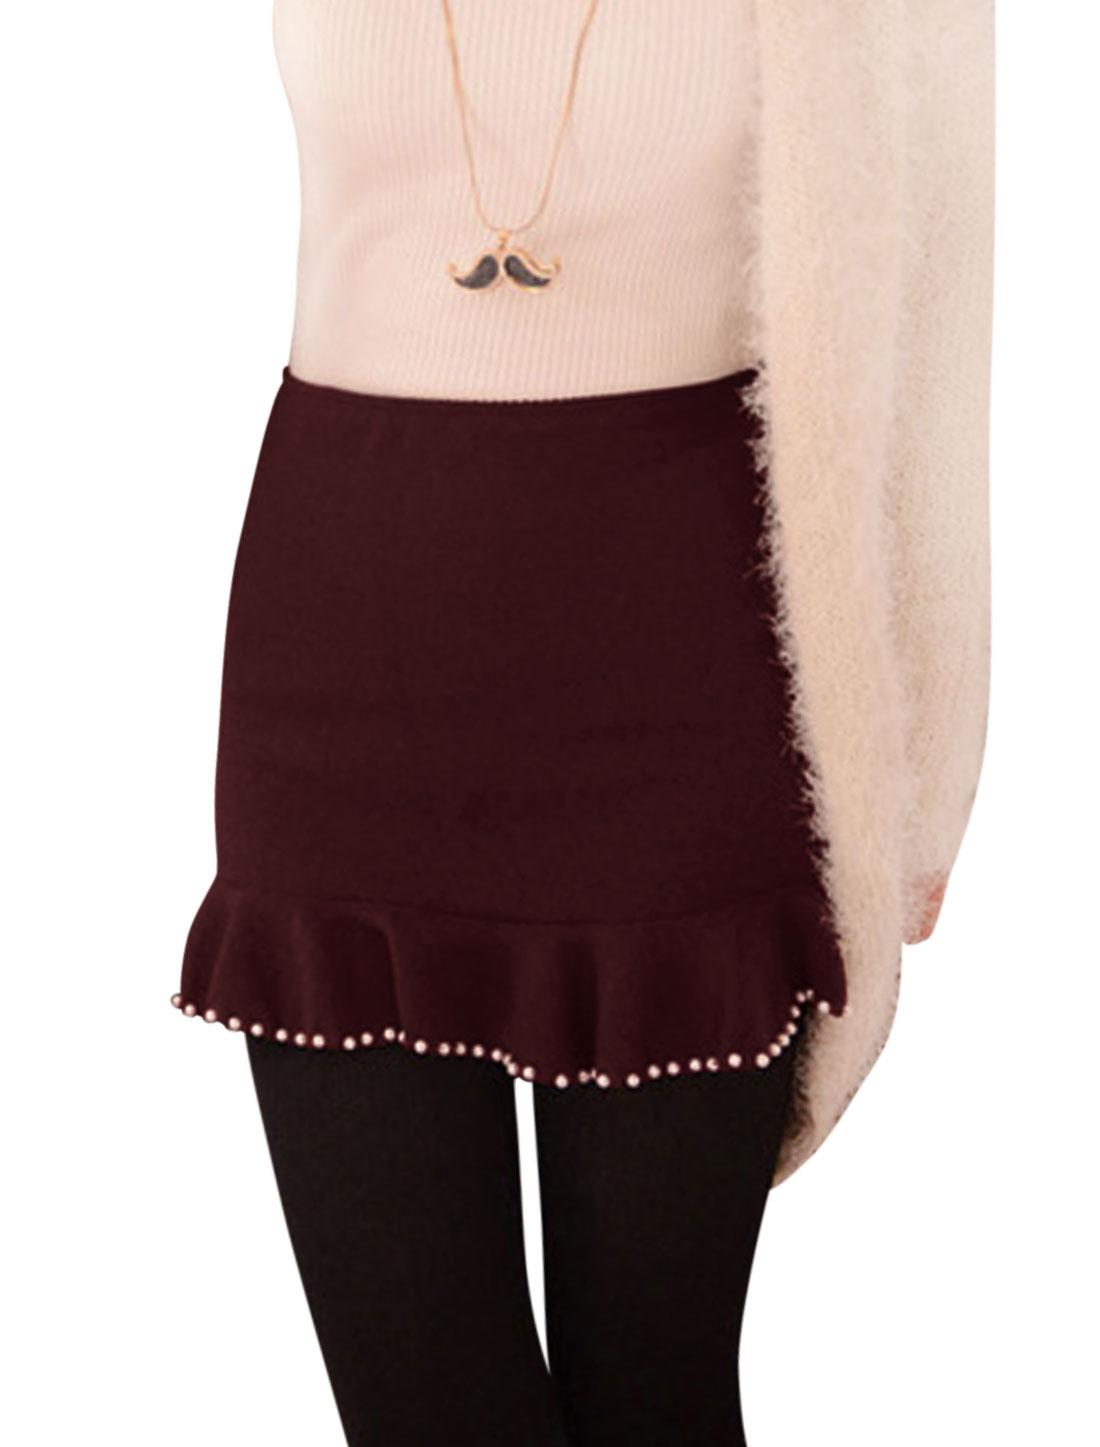 Woman Beads Decor Ruffled Hem Over Hip Burgundy Knit Skirt M